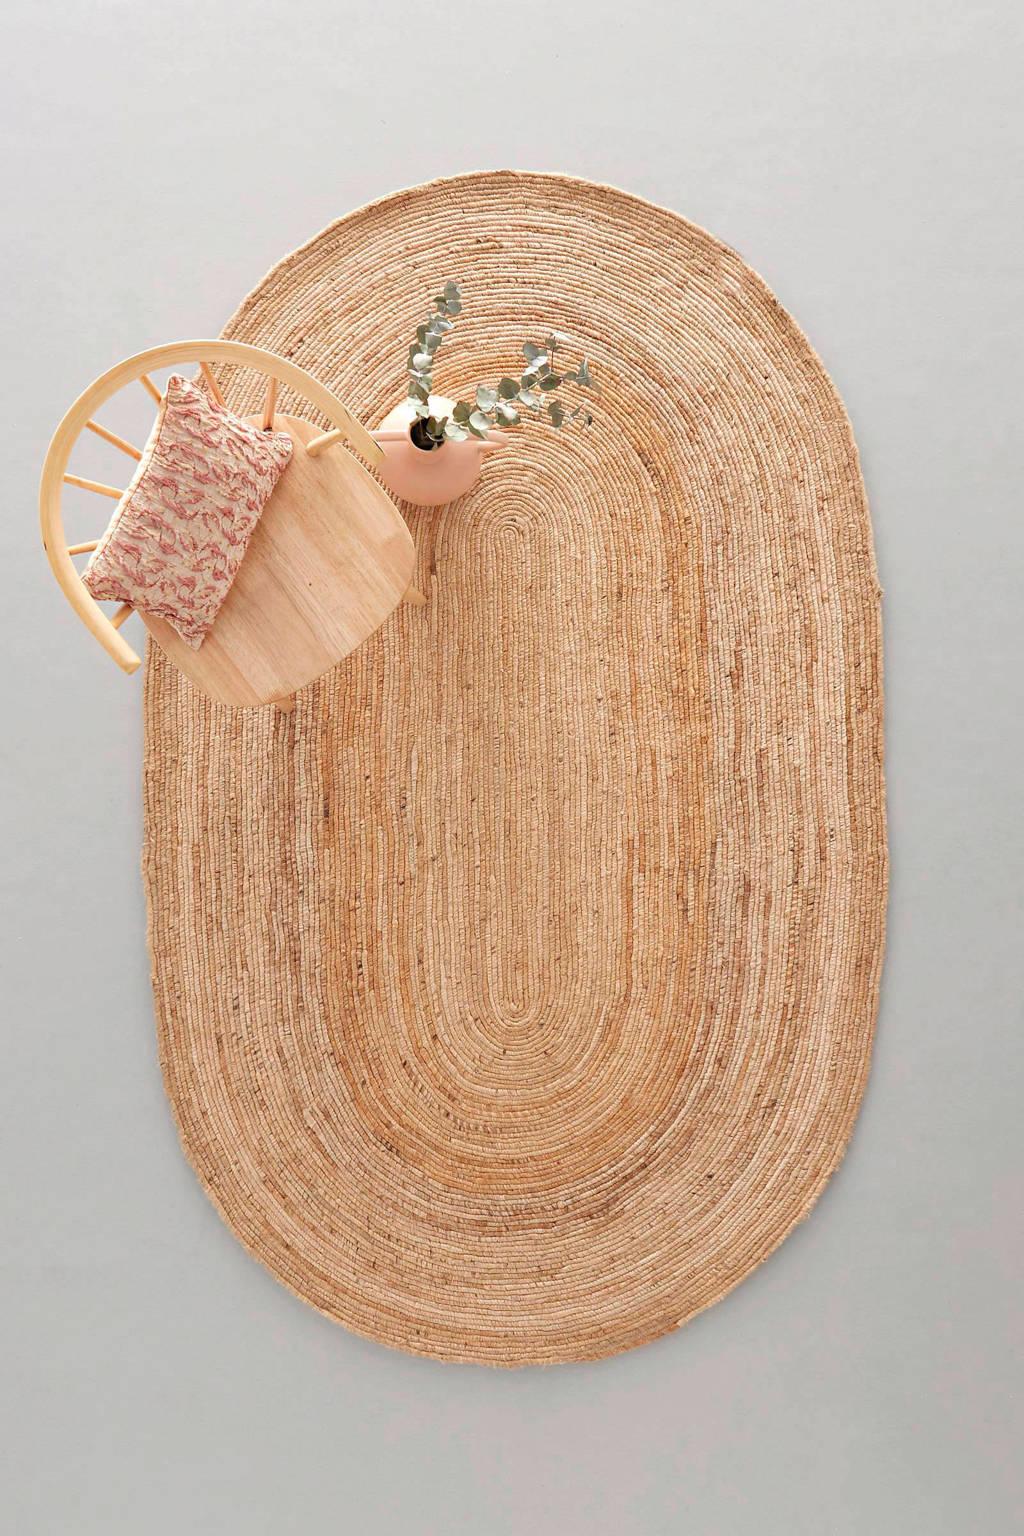 whkmp's own vloerkleed Hiske  (300x200 cm)